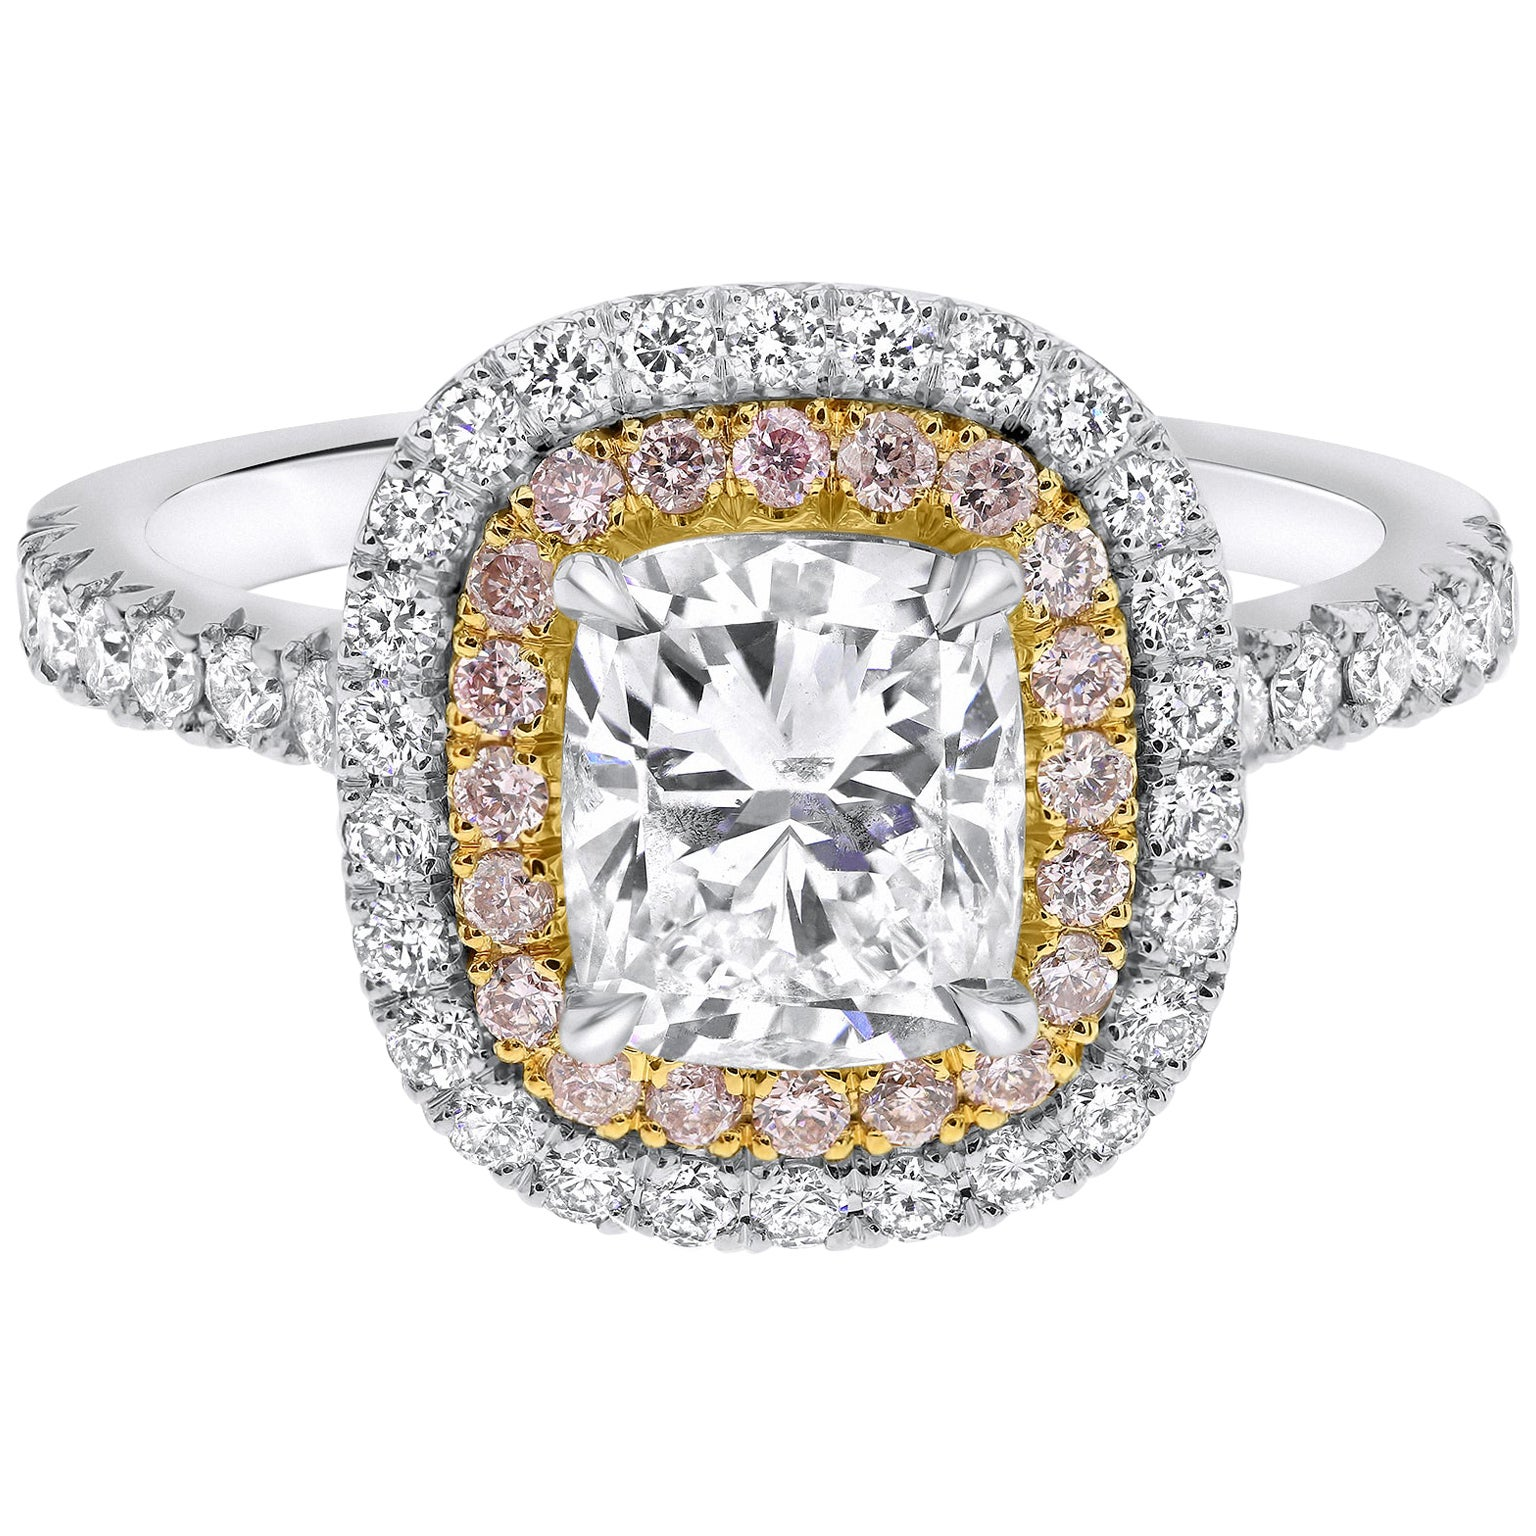 Shlomit Rogel, Kortney Double Halo Diamond Ring in 14 Karat White Gold